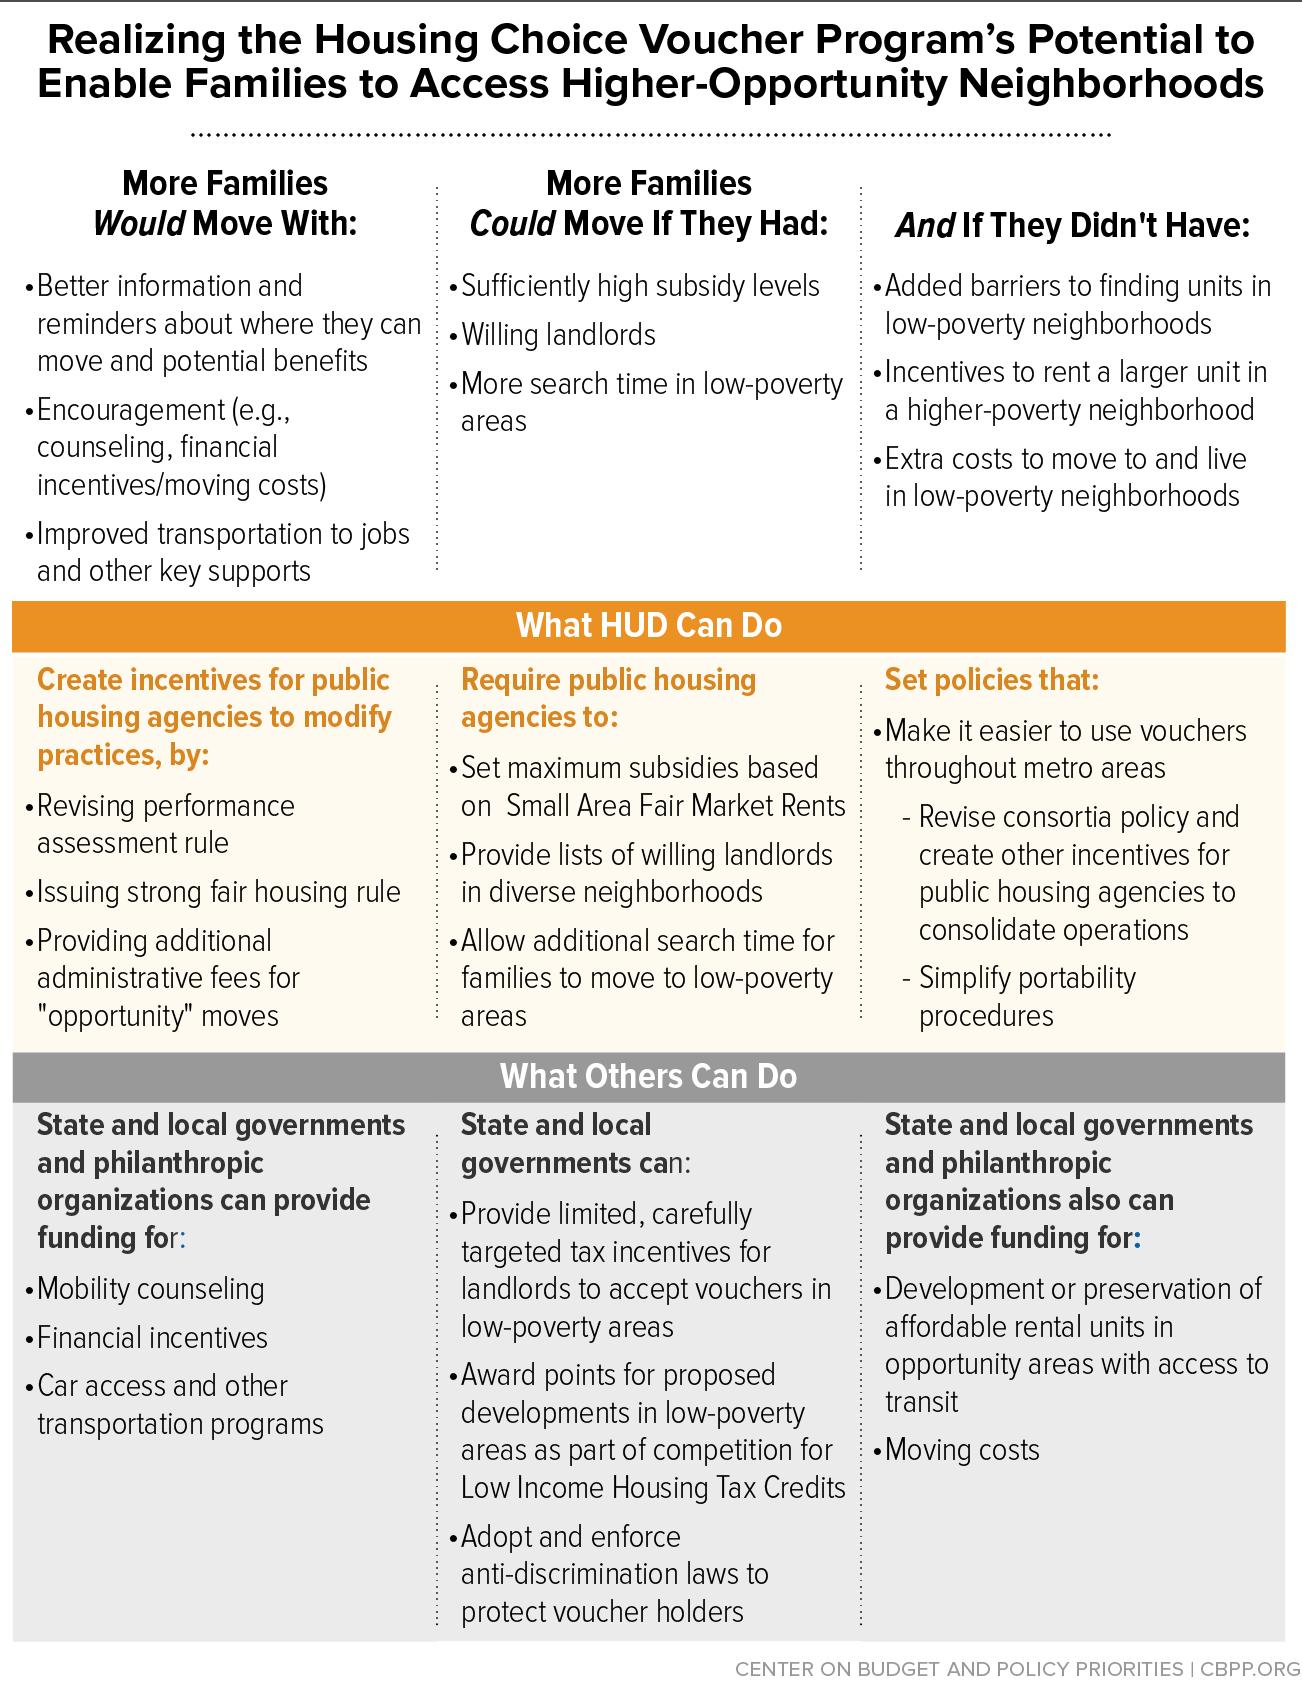 Realizing The Housing Choice Voucher Program S Potential